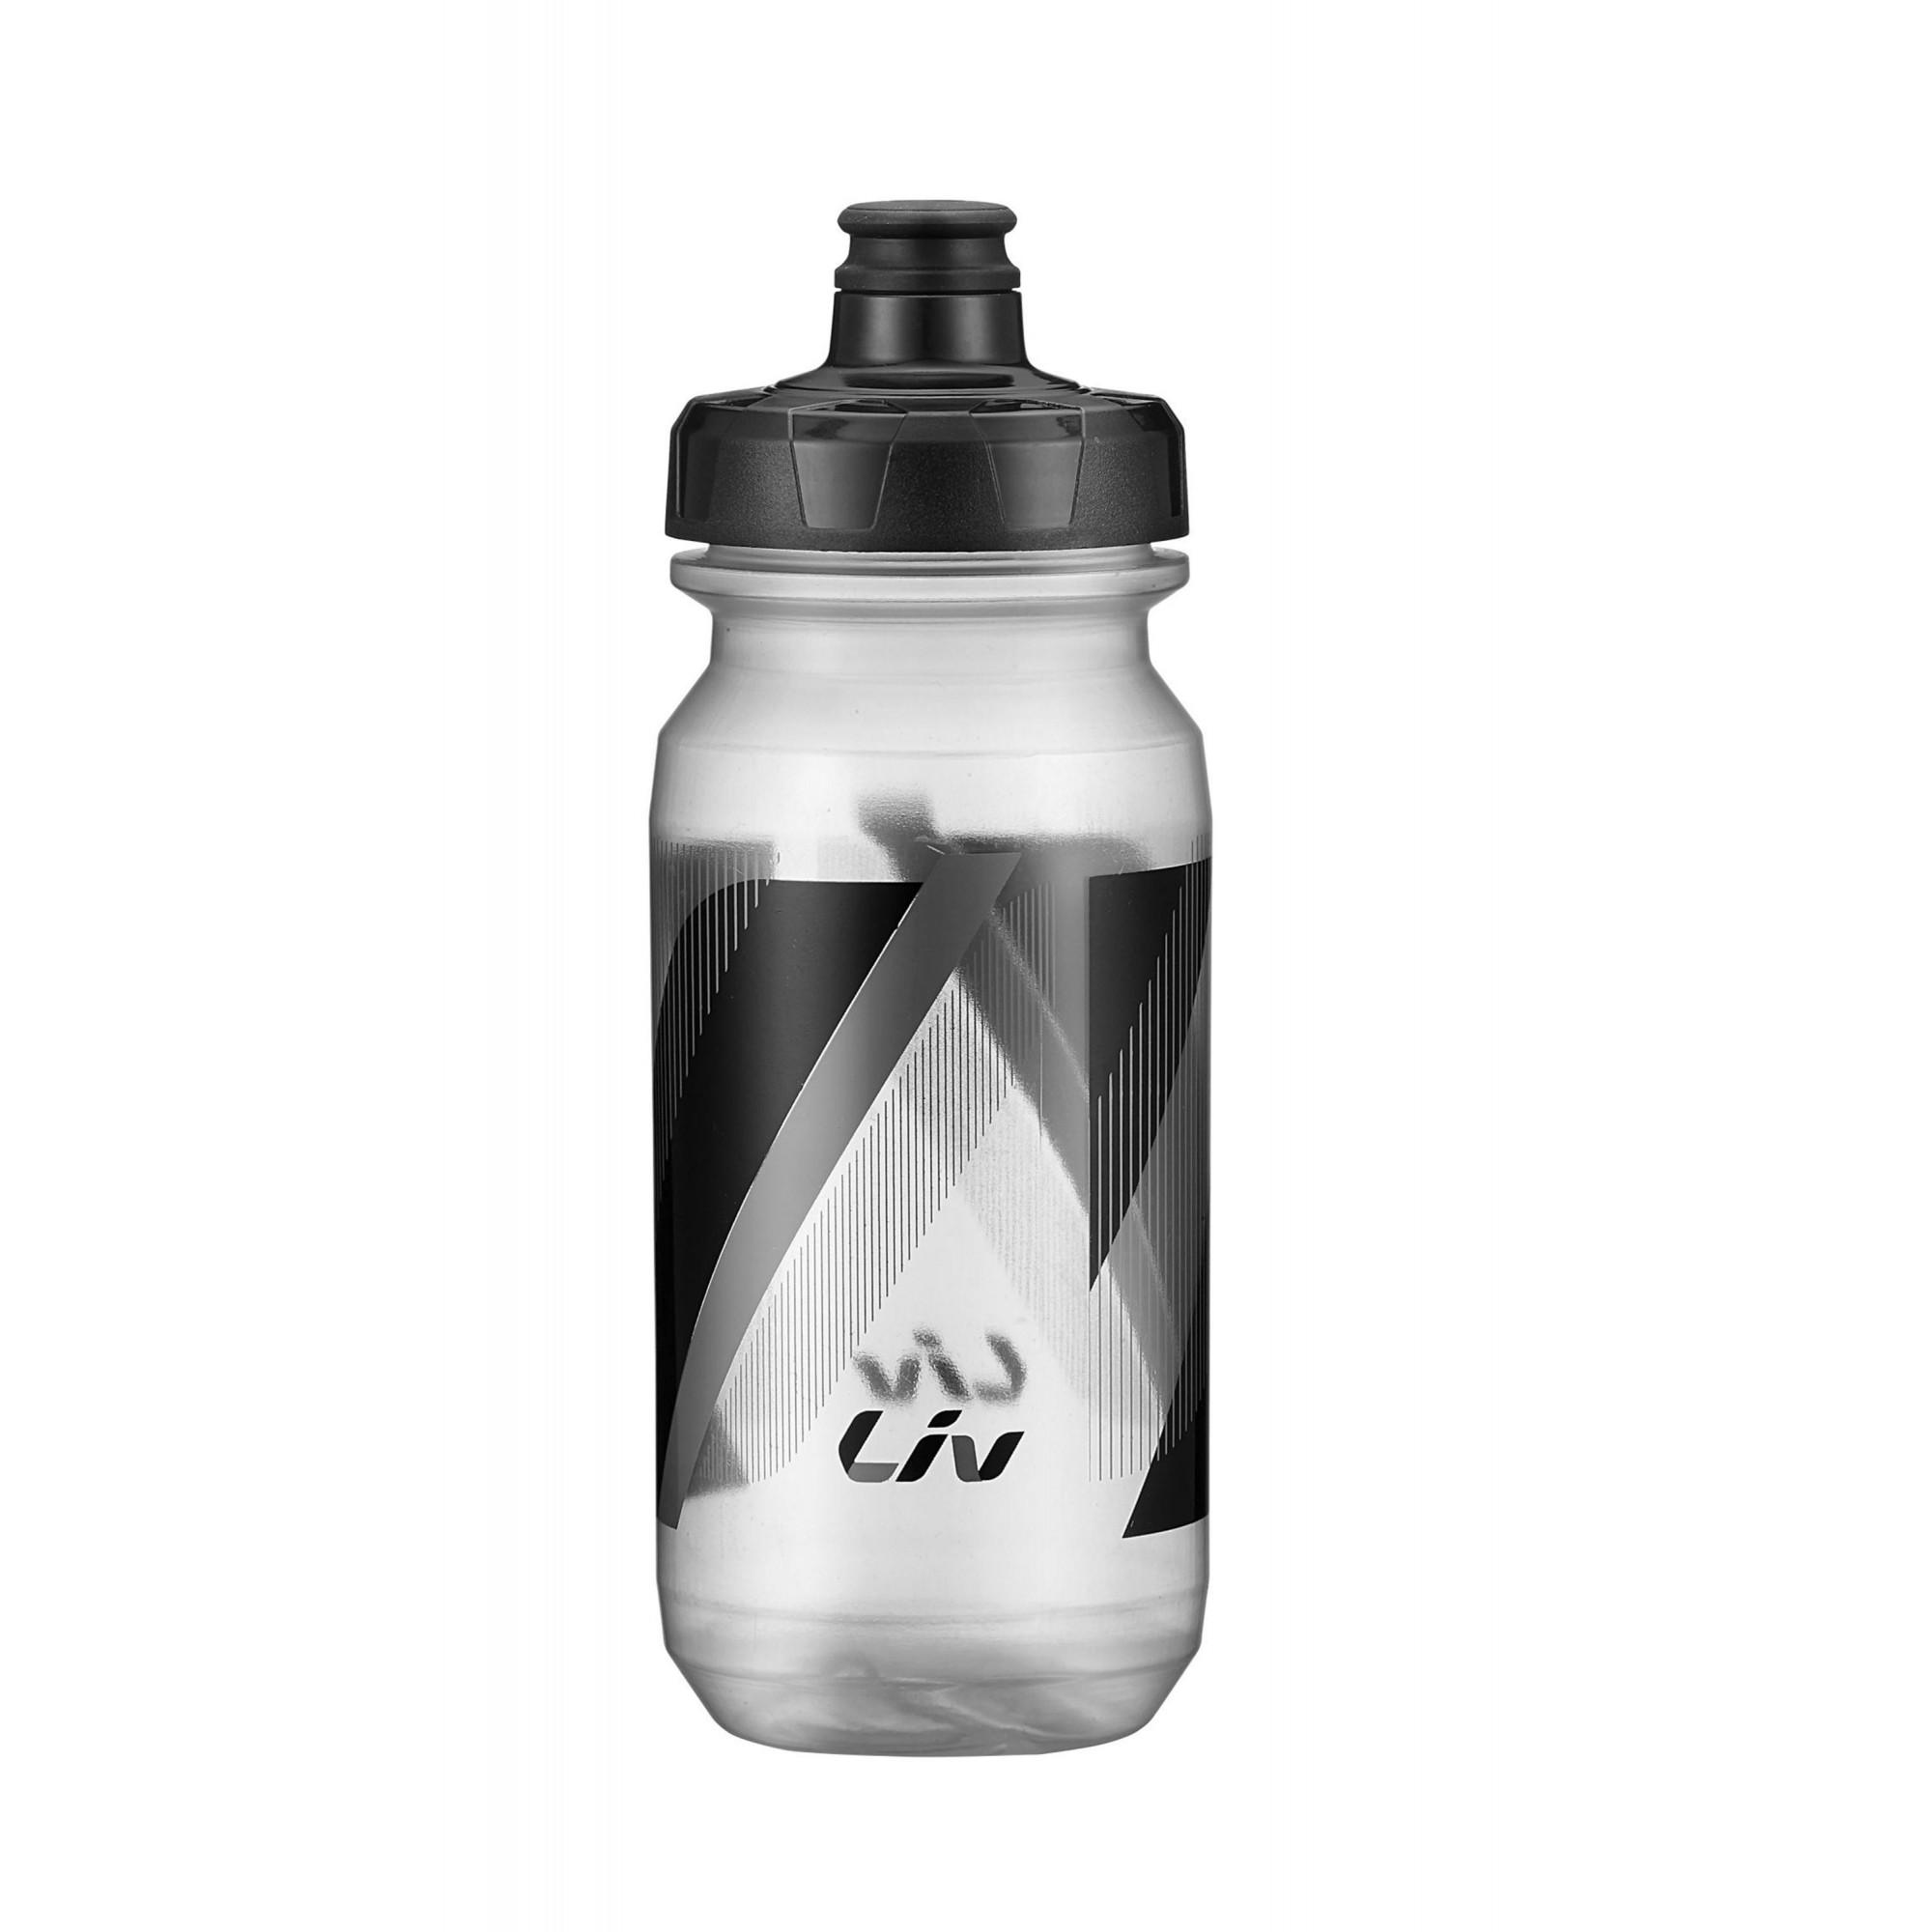 Bidon LIV Cleanspring transparent noir gris 600 & 750ml